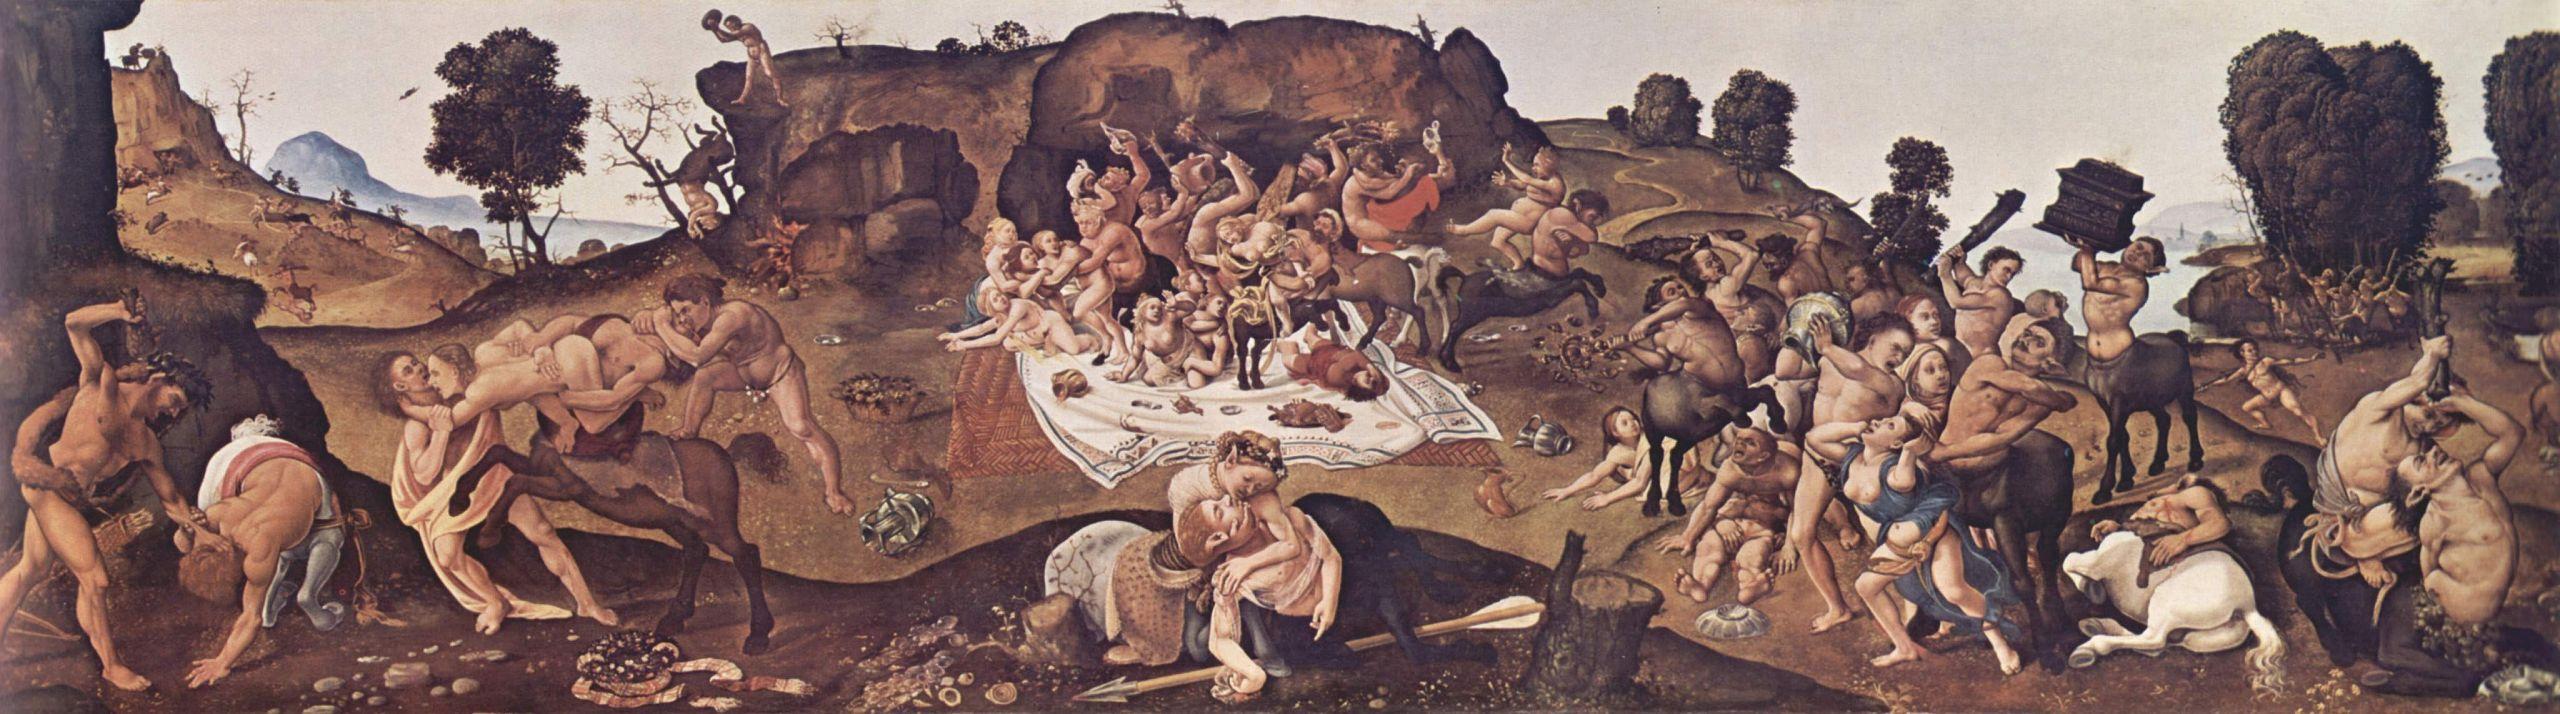 Пьеро ди Козимо. Битва кентавров и лапифов